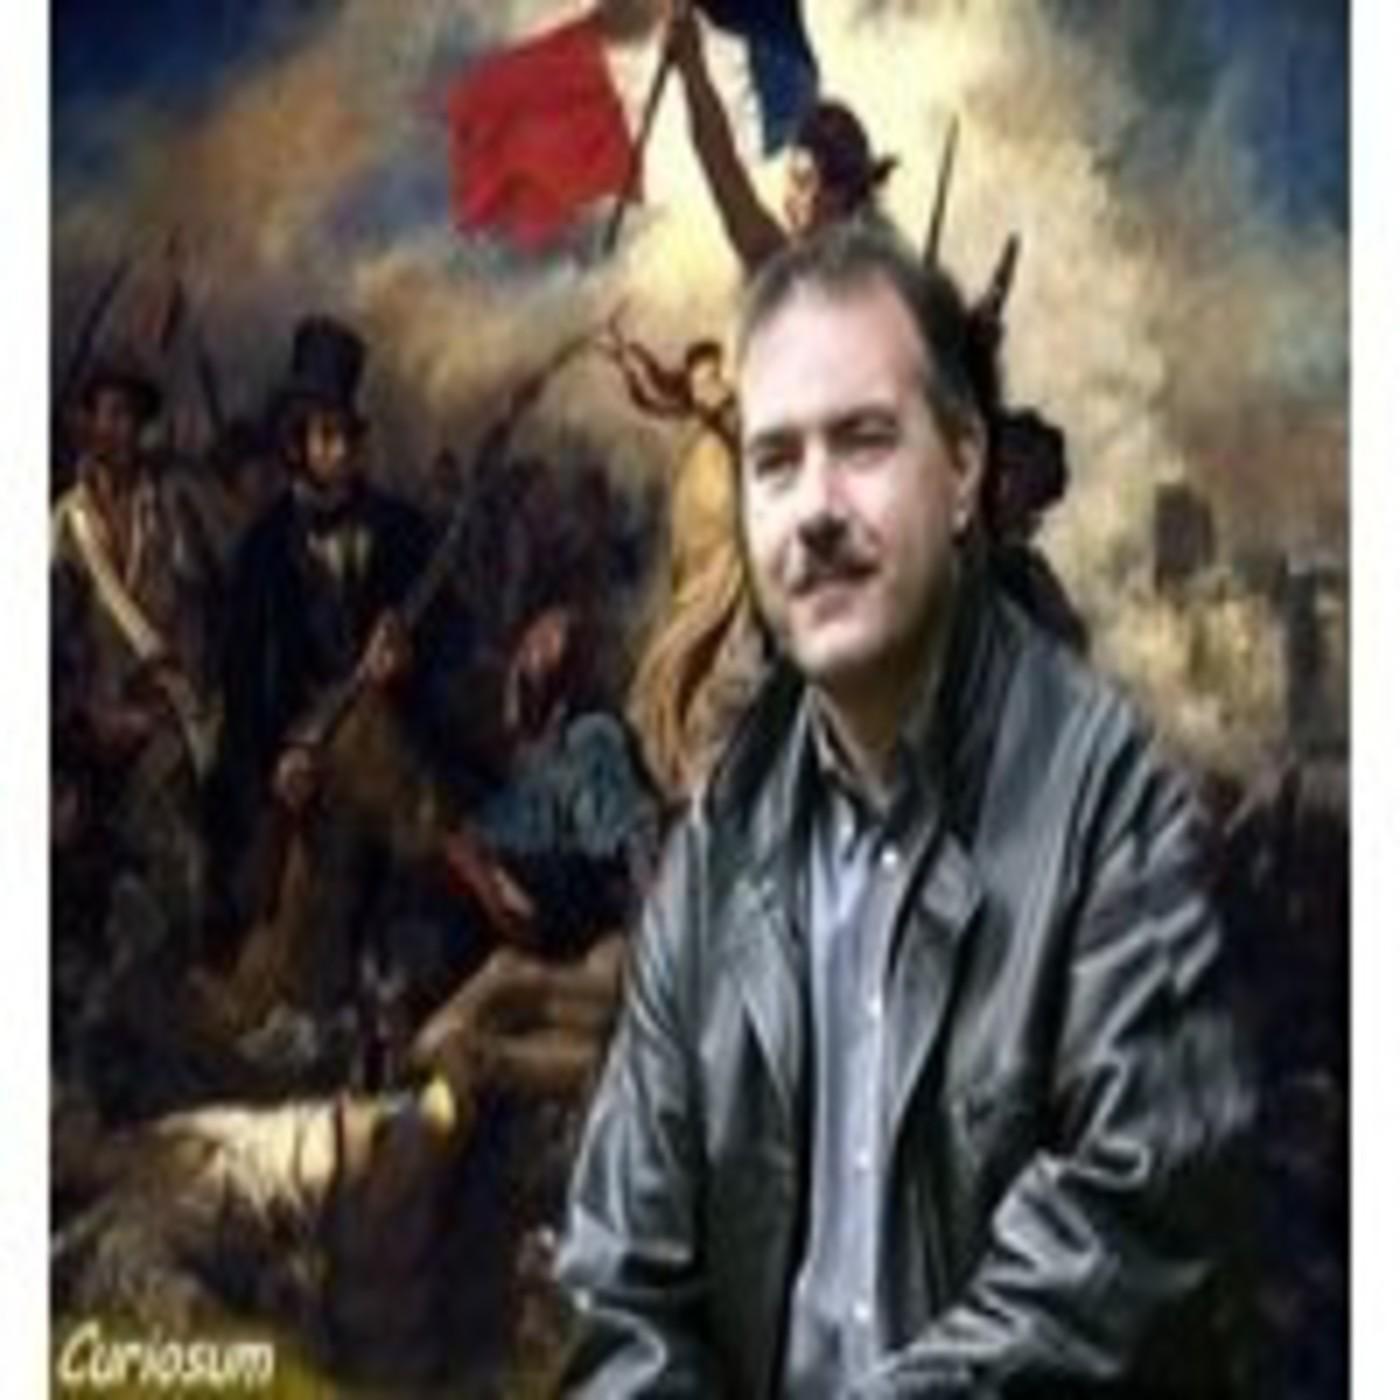 Pasajes de la historia. Napoleón Bonaperte contra Madame Staël.